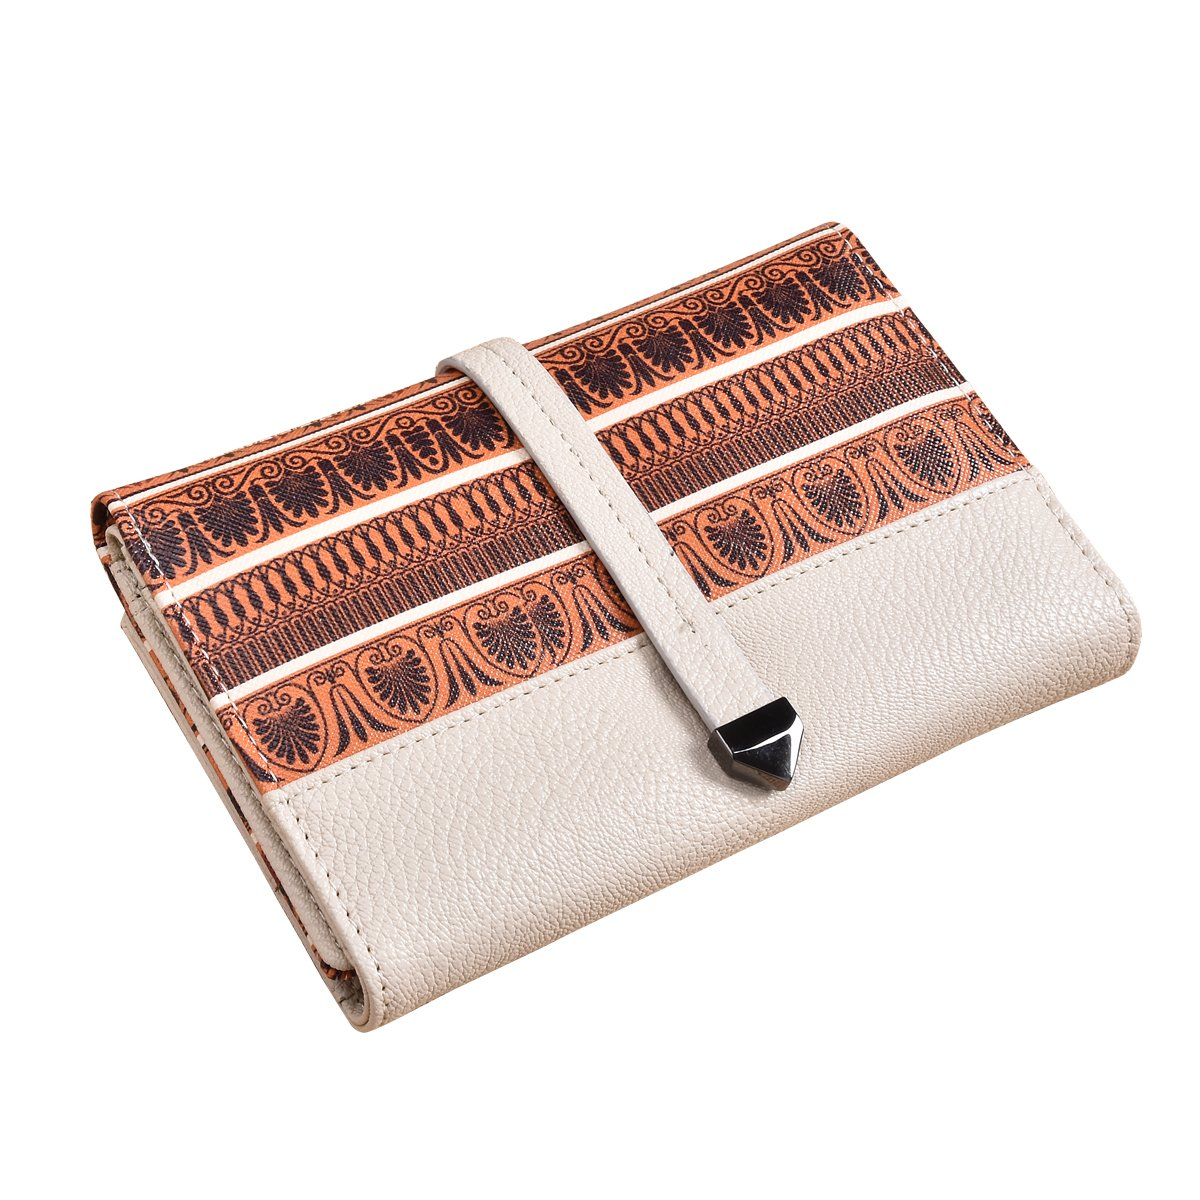 f21de58367db Epokris Womens Multi Card Case Purse Organizer Thin Gift Wallet for Girls  QB015